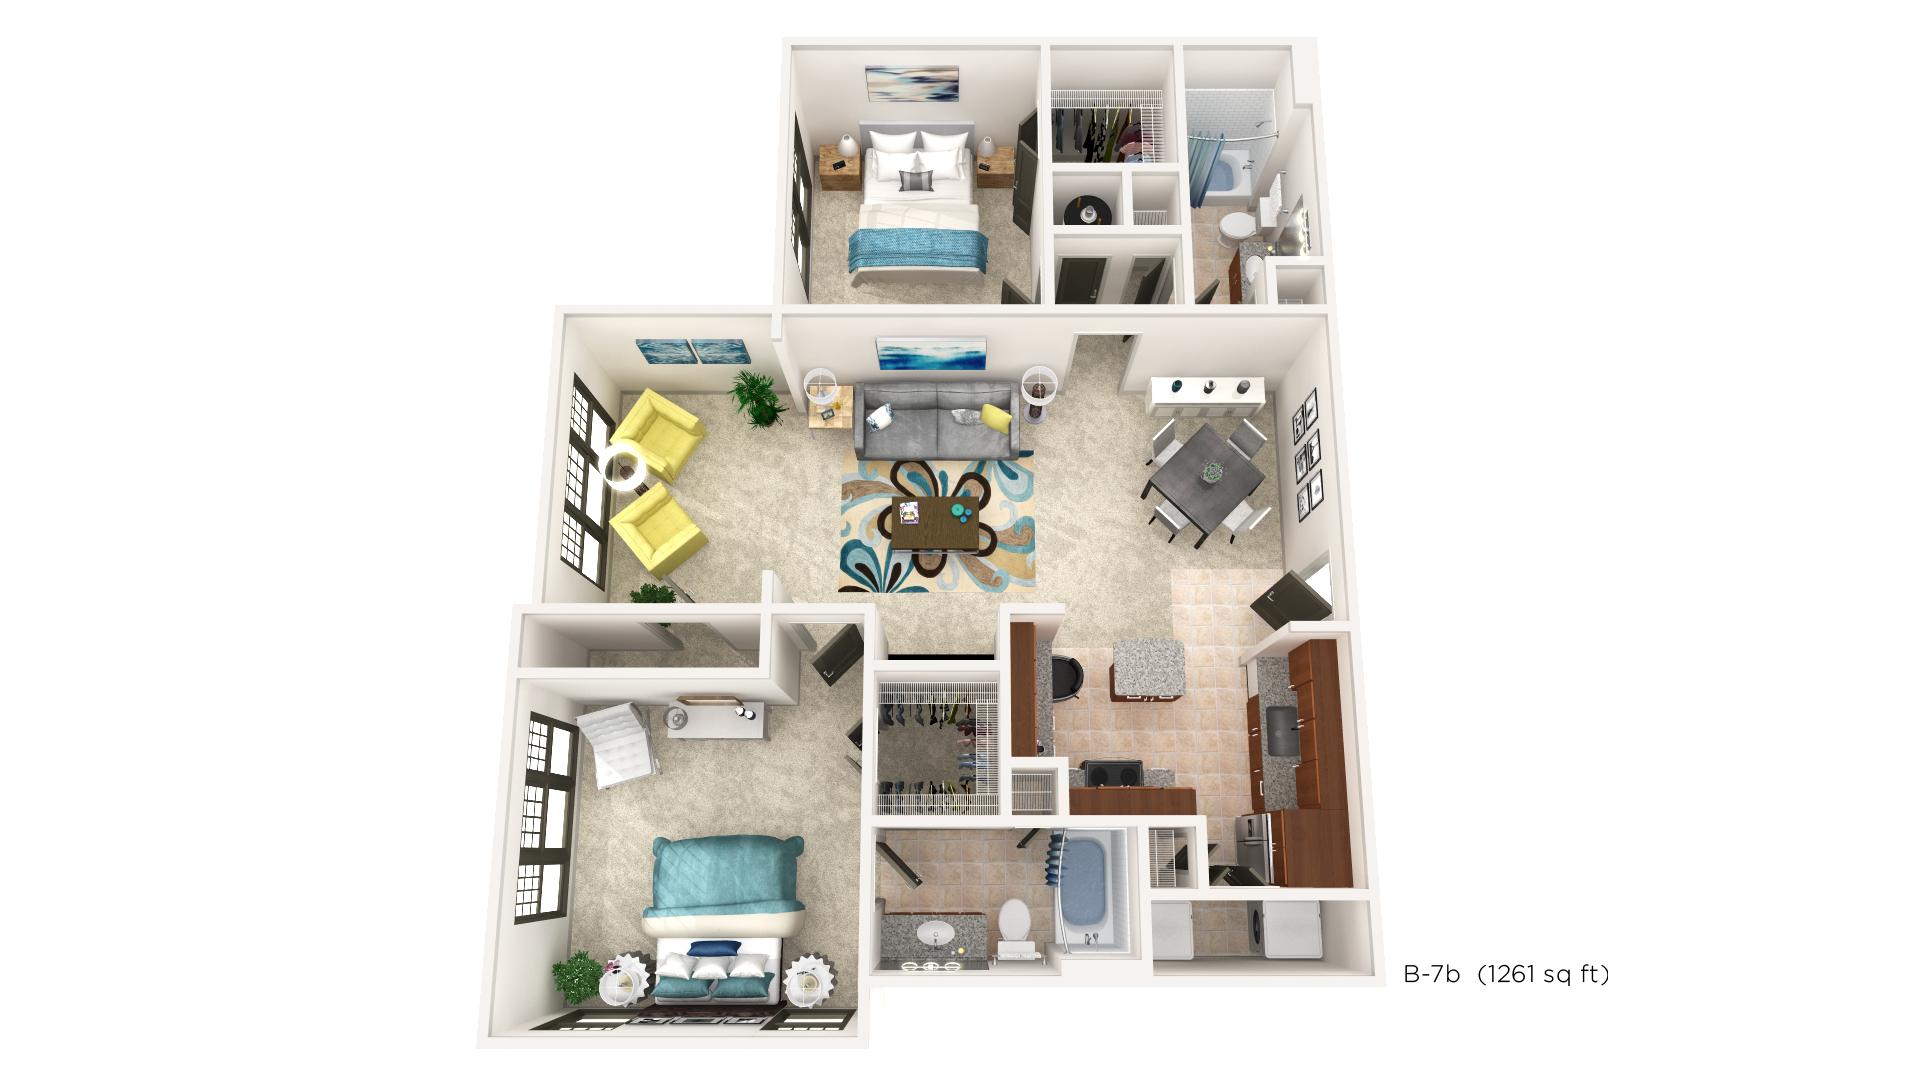 Brookleigh Flats Luxury Apartment Homes - Floorplan - B-7B